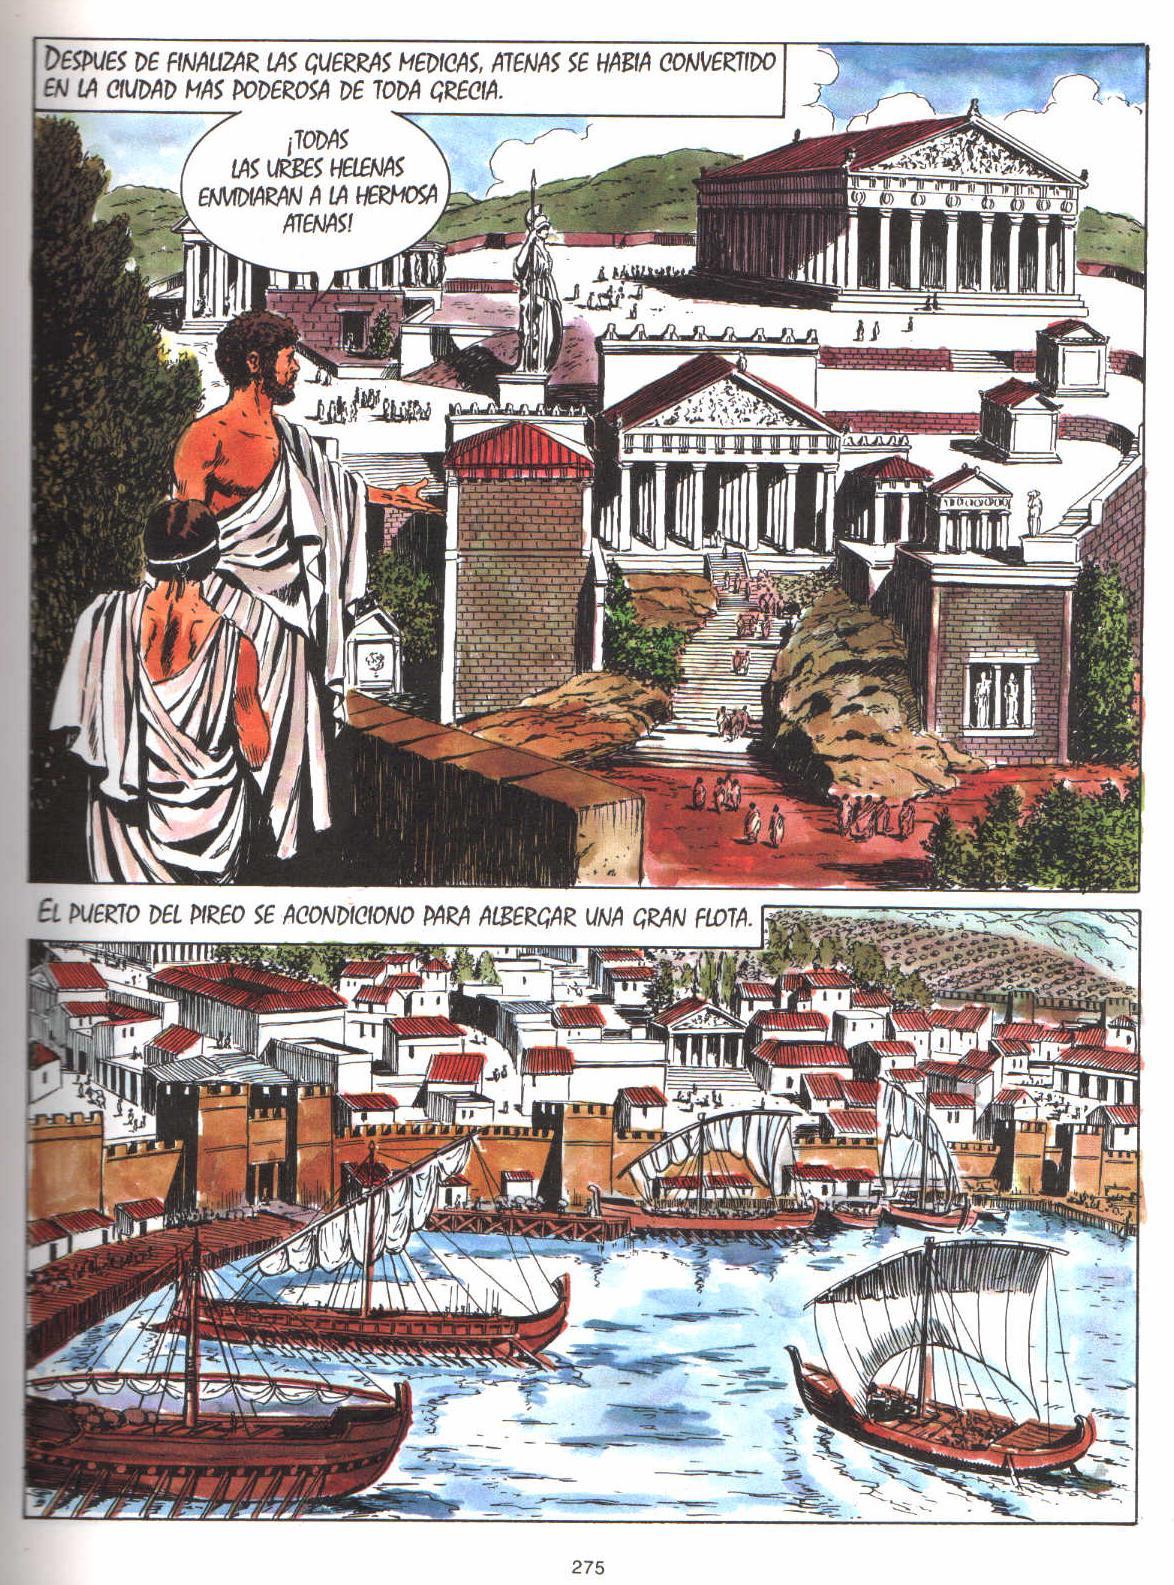 Sociales y lengua c mic historia de grecia ii for Cultura de la antigua grecia